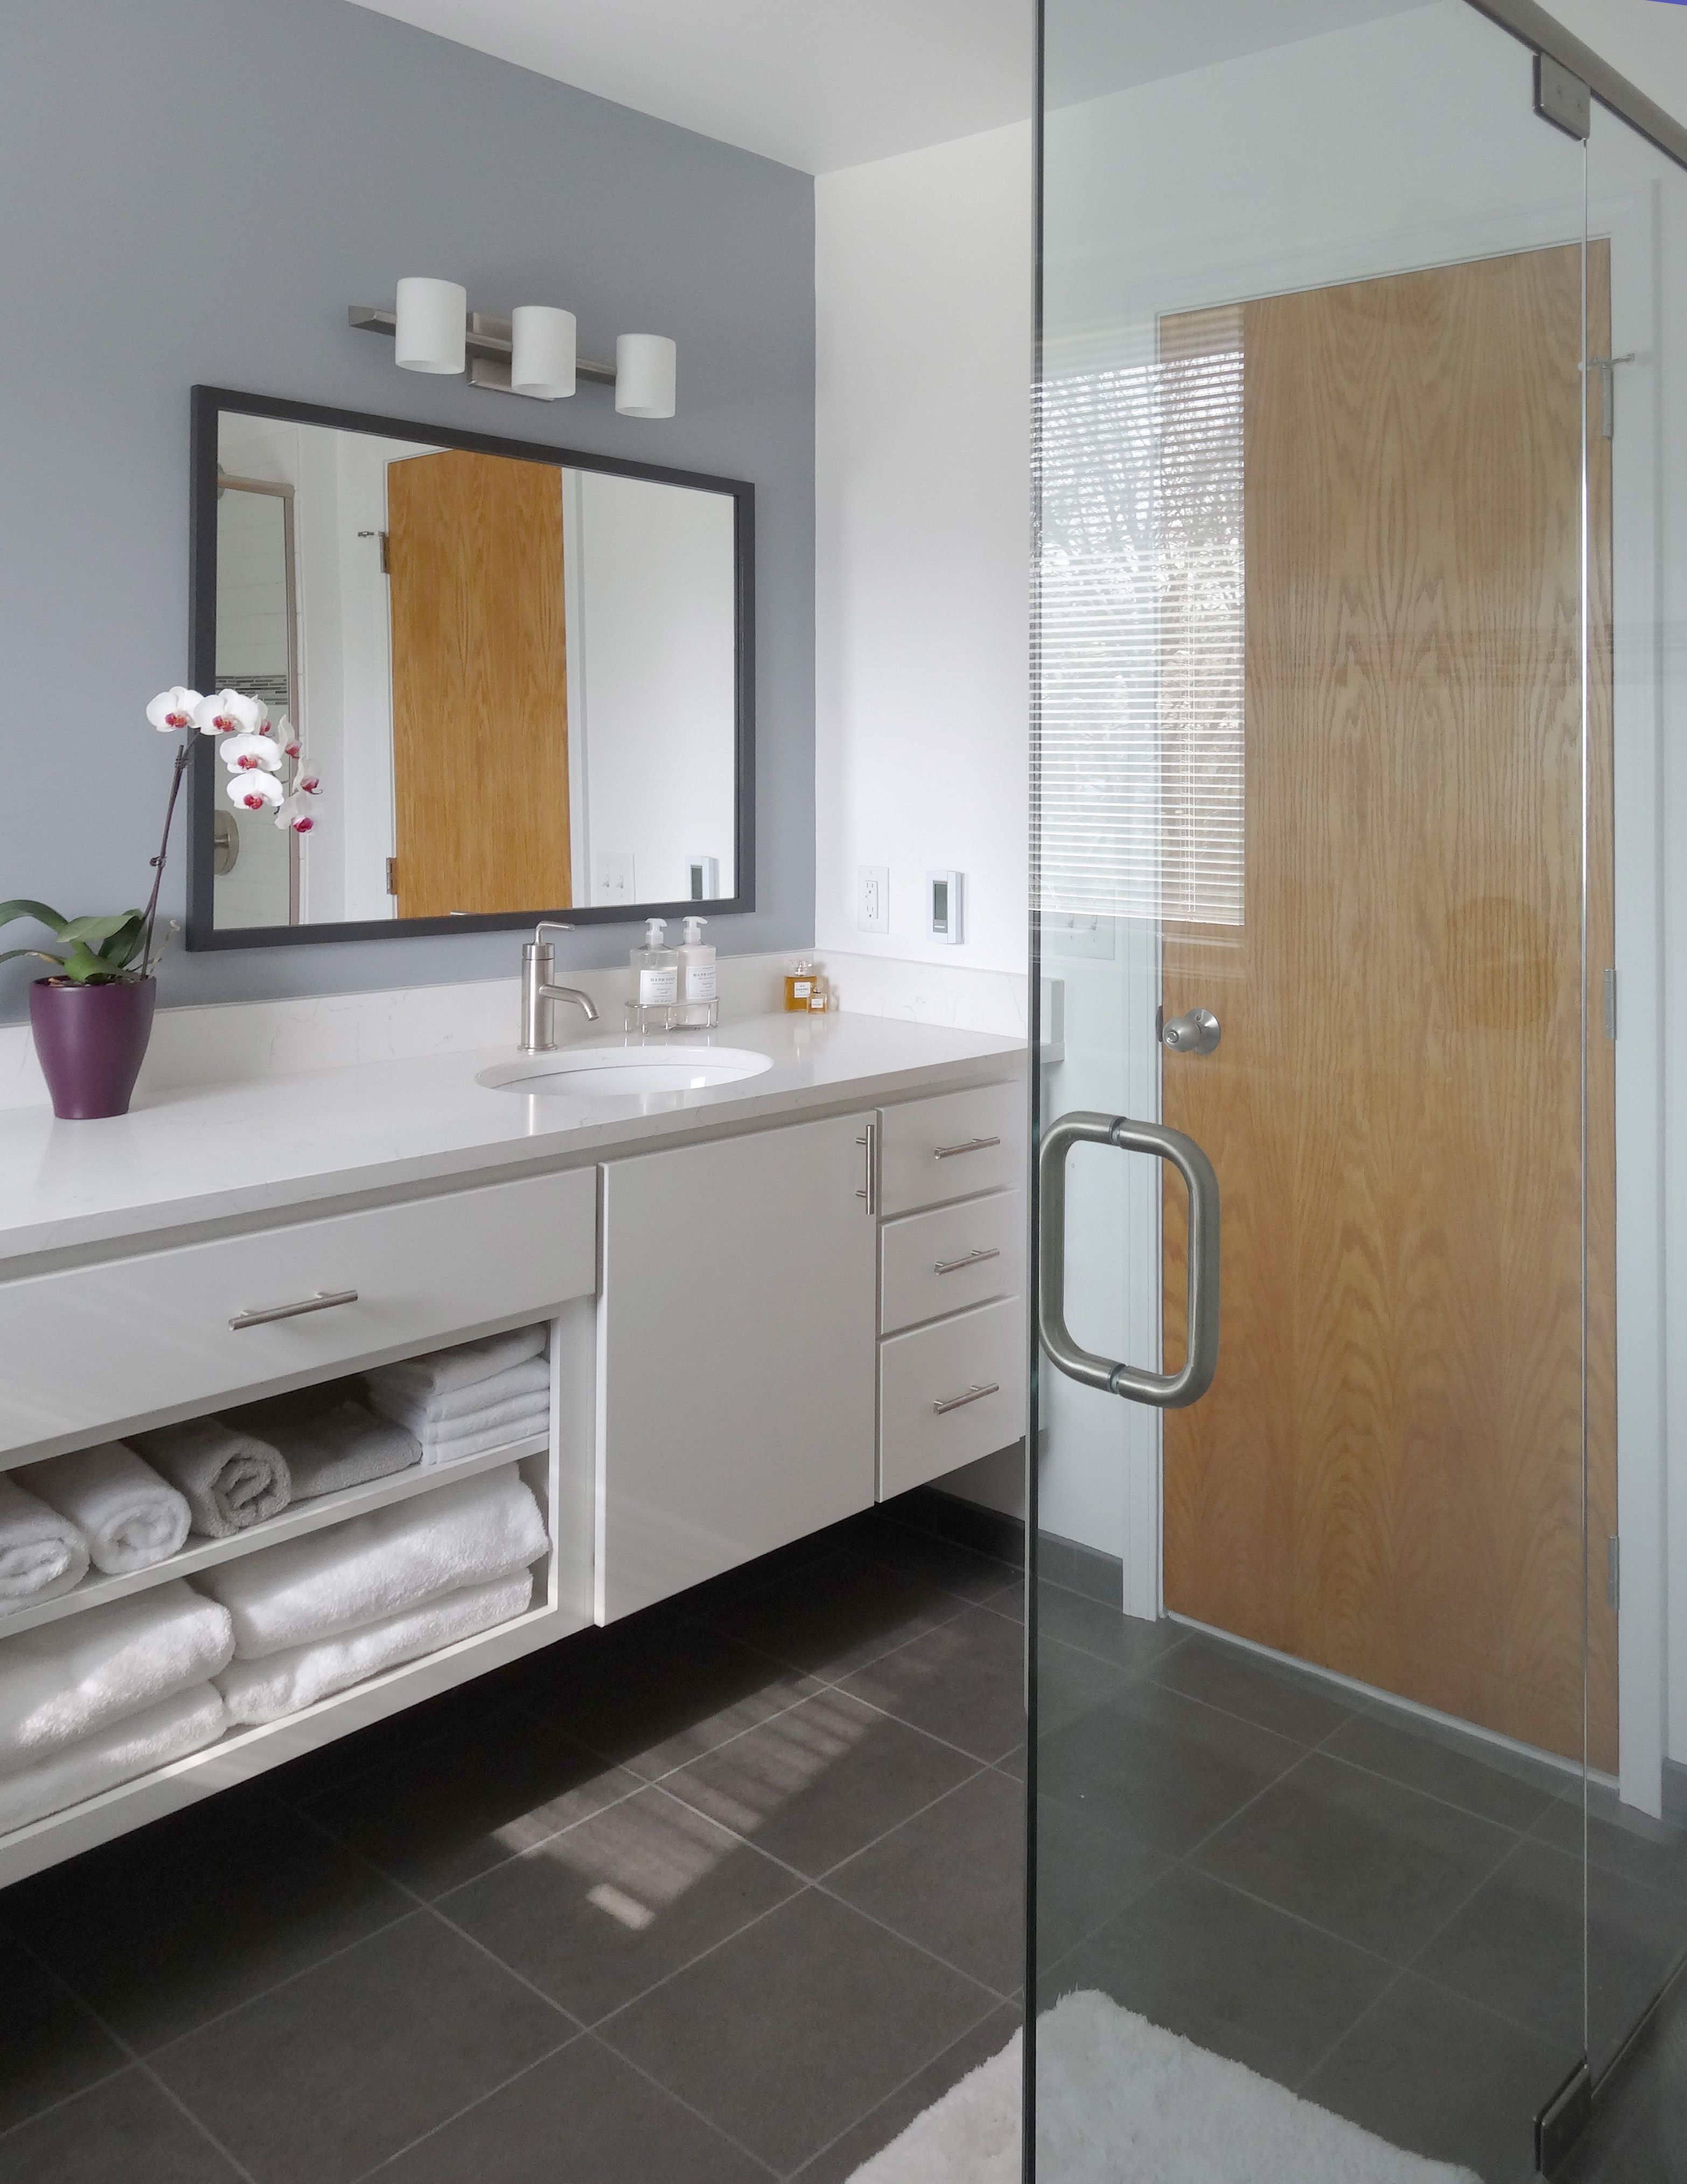 Vicostone Countertops Slate Grey Flooring Exposed Towel Shelf And - Bathroom remodel ann arbor